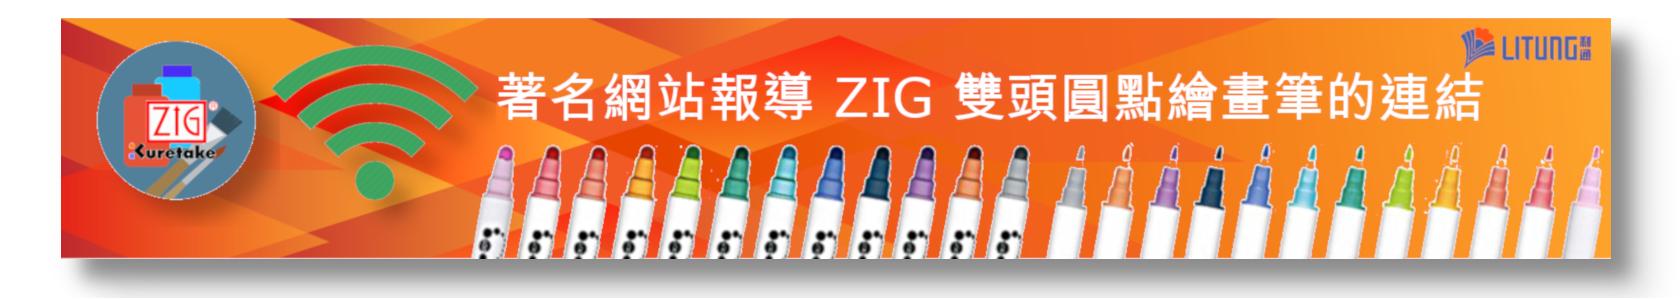 Banner ZIG TC-6100DP112雙頭圓點繪畫筆 web Links LTlogo 1680x300